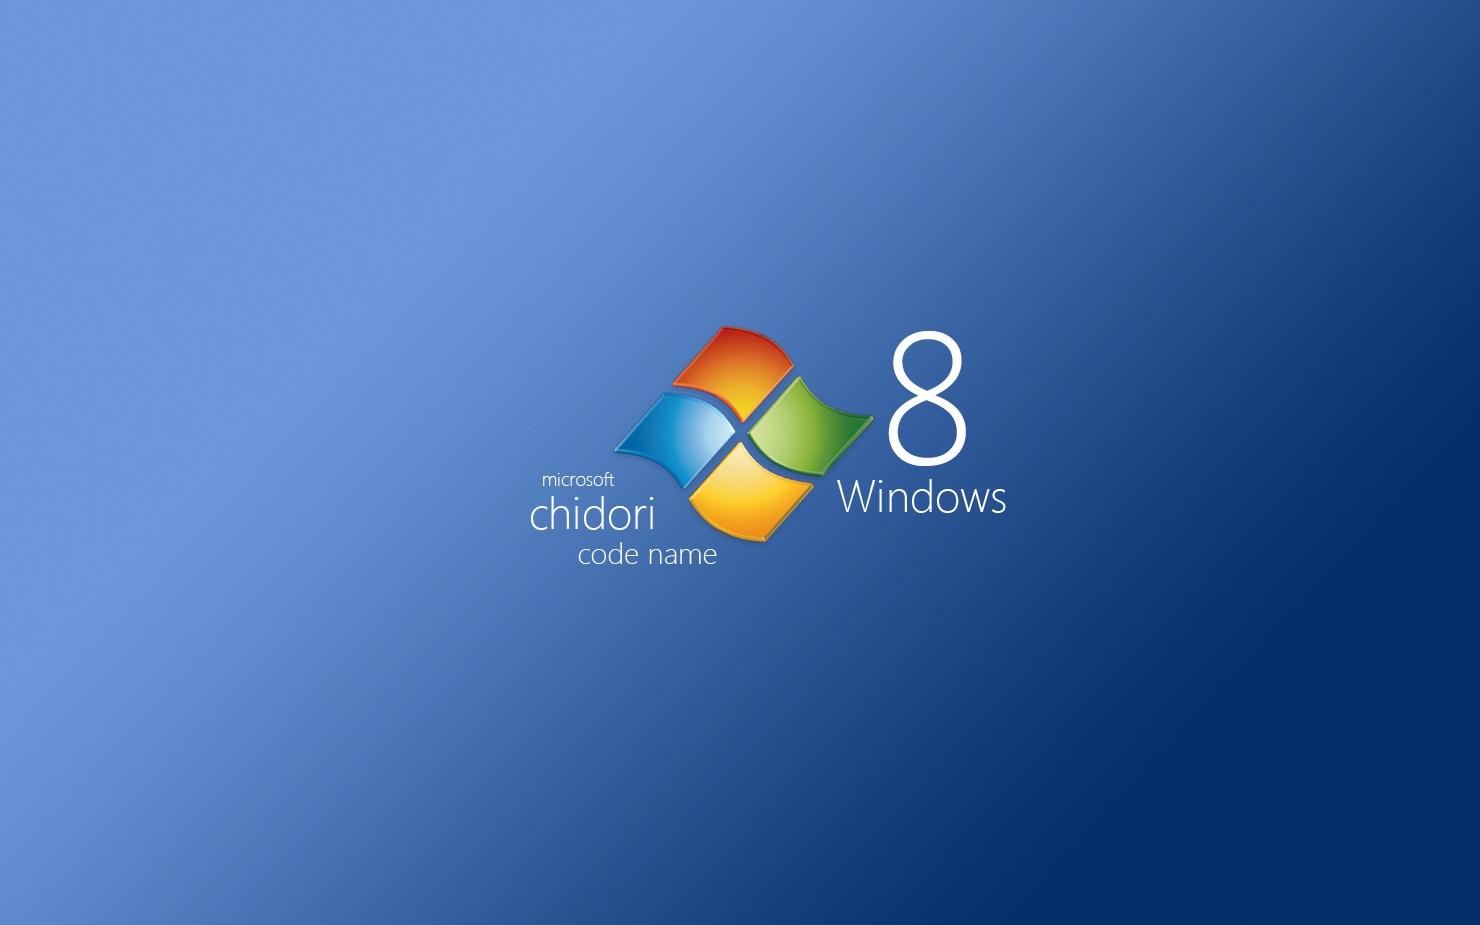 chidori Windows 8 Wallpapers